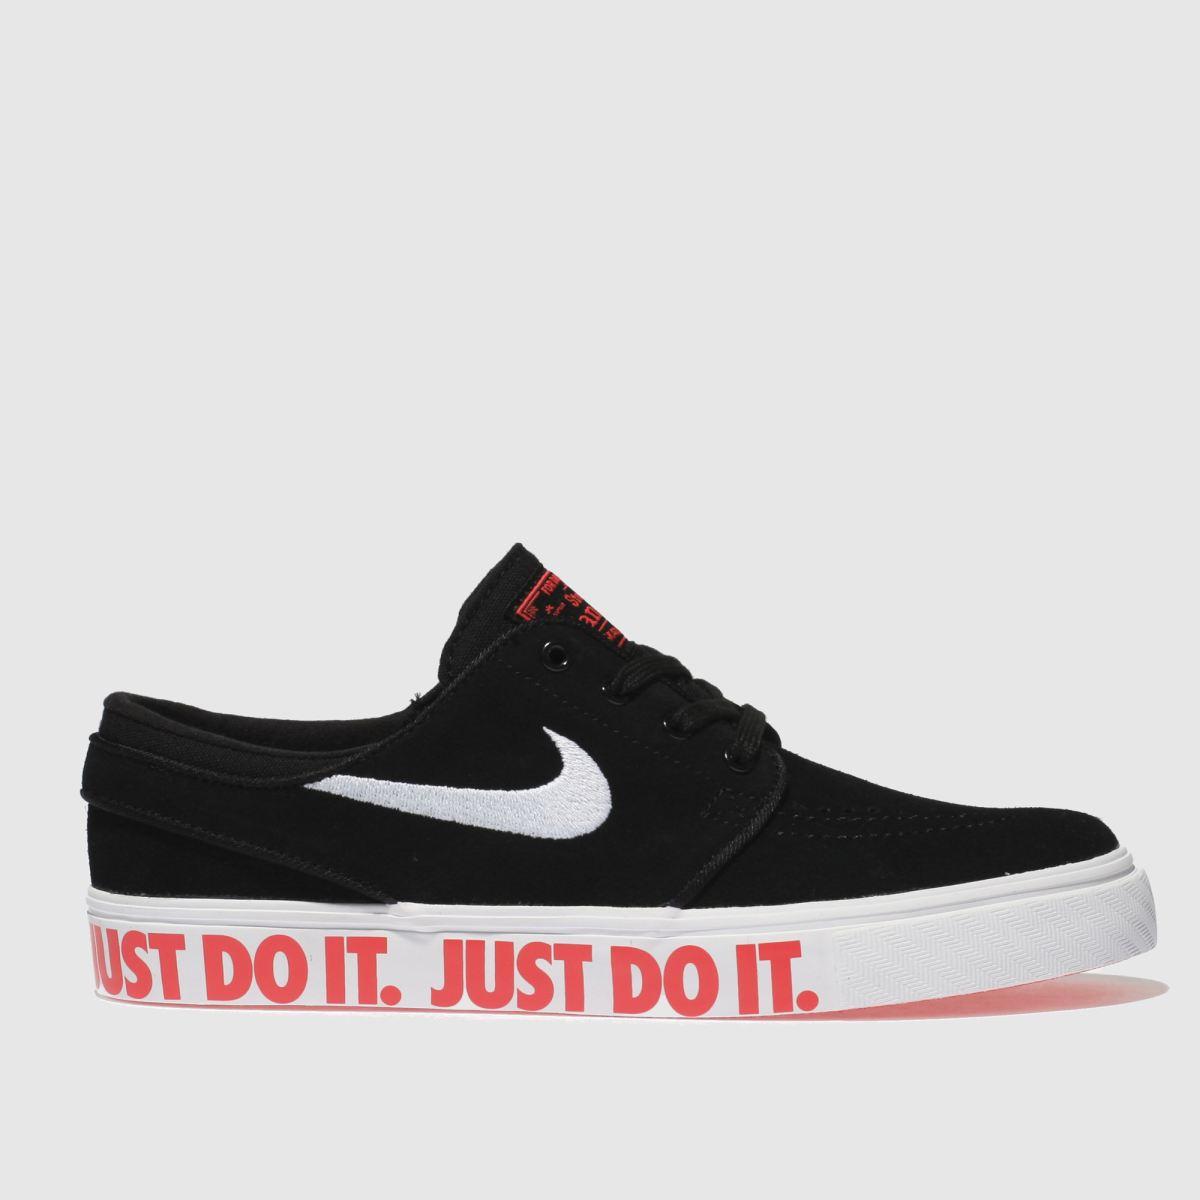 Nike SB Nike Sb Black & White Stefan Janoski Jdi Youth Trainers